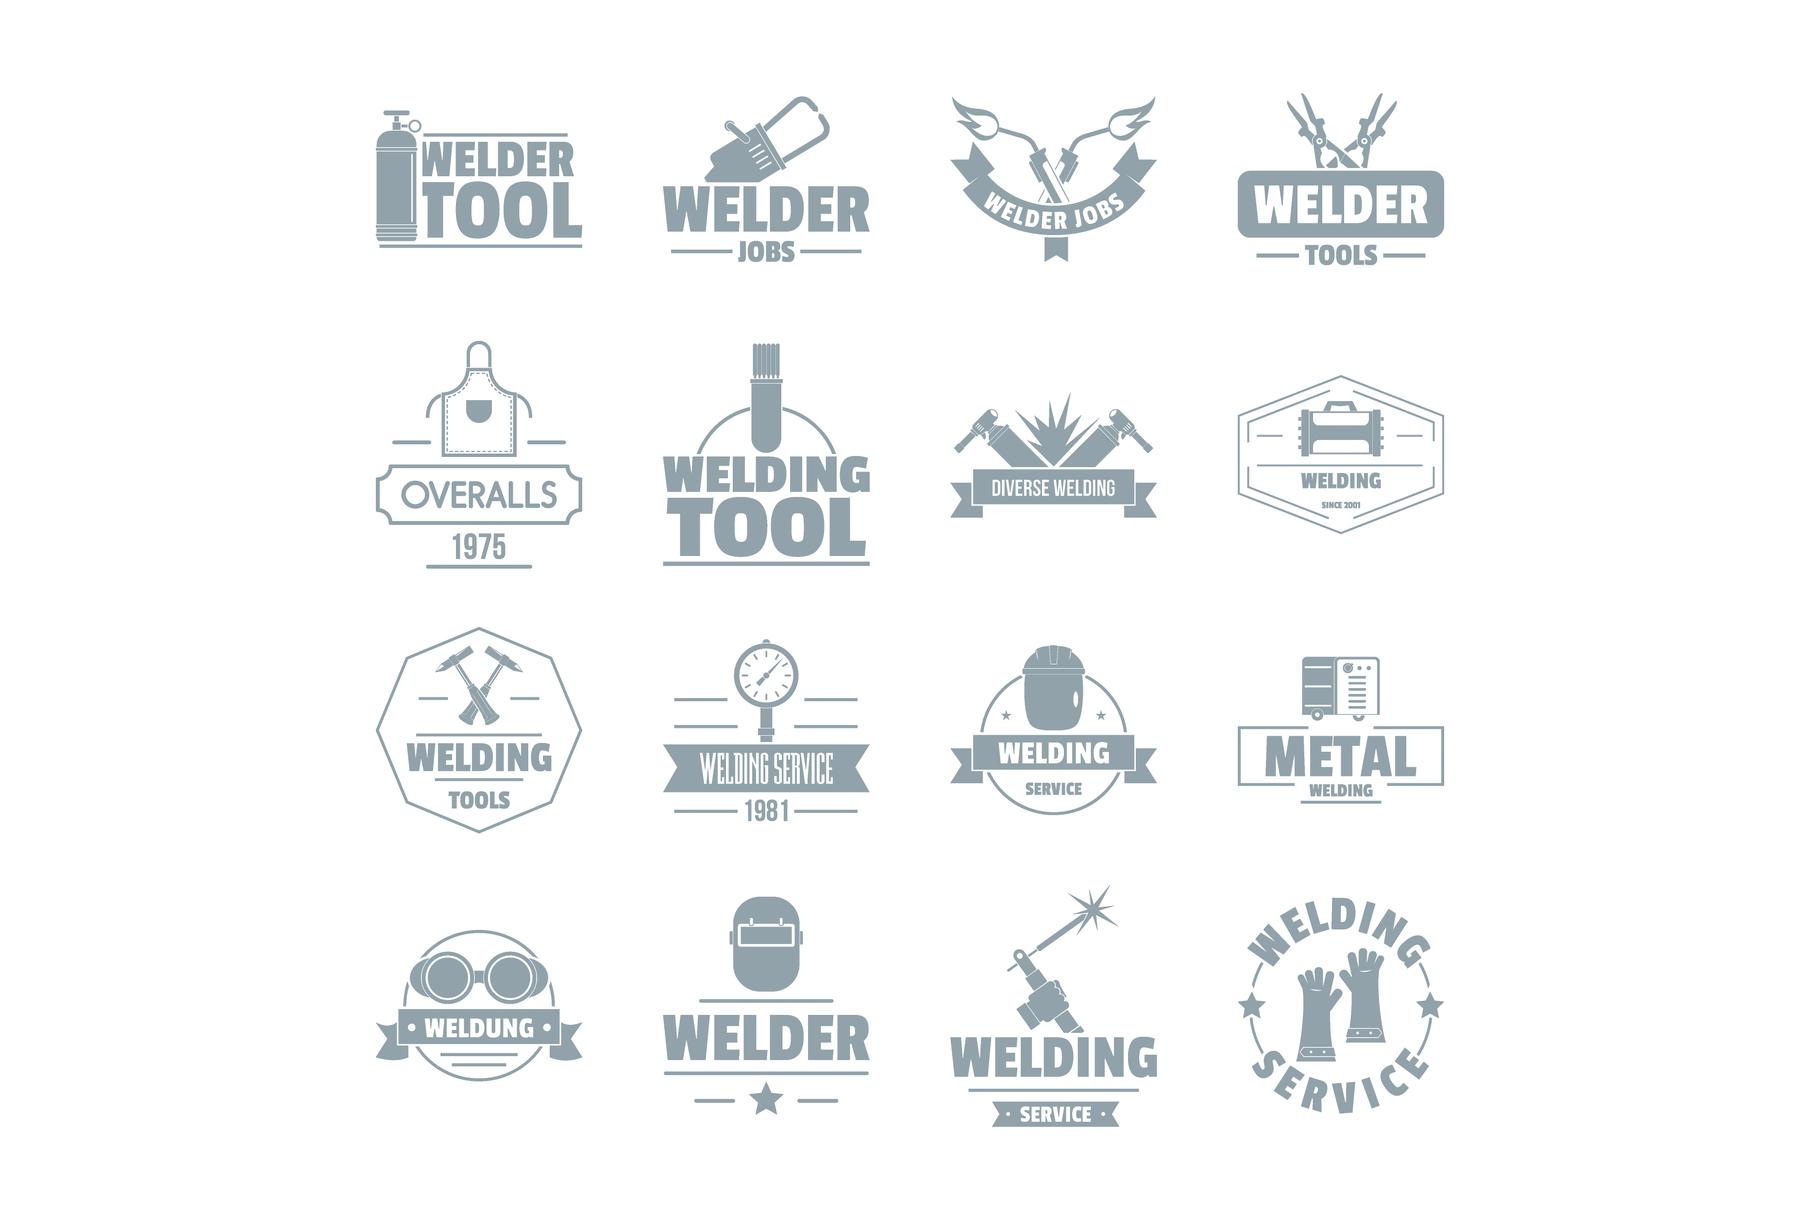 Welding logo icons set, simple style example image 1